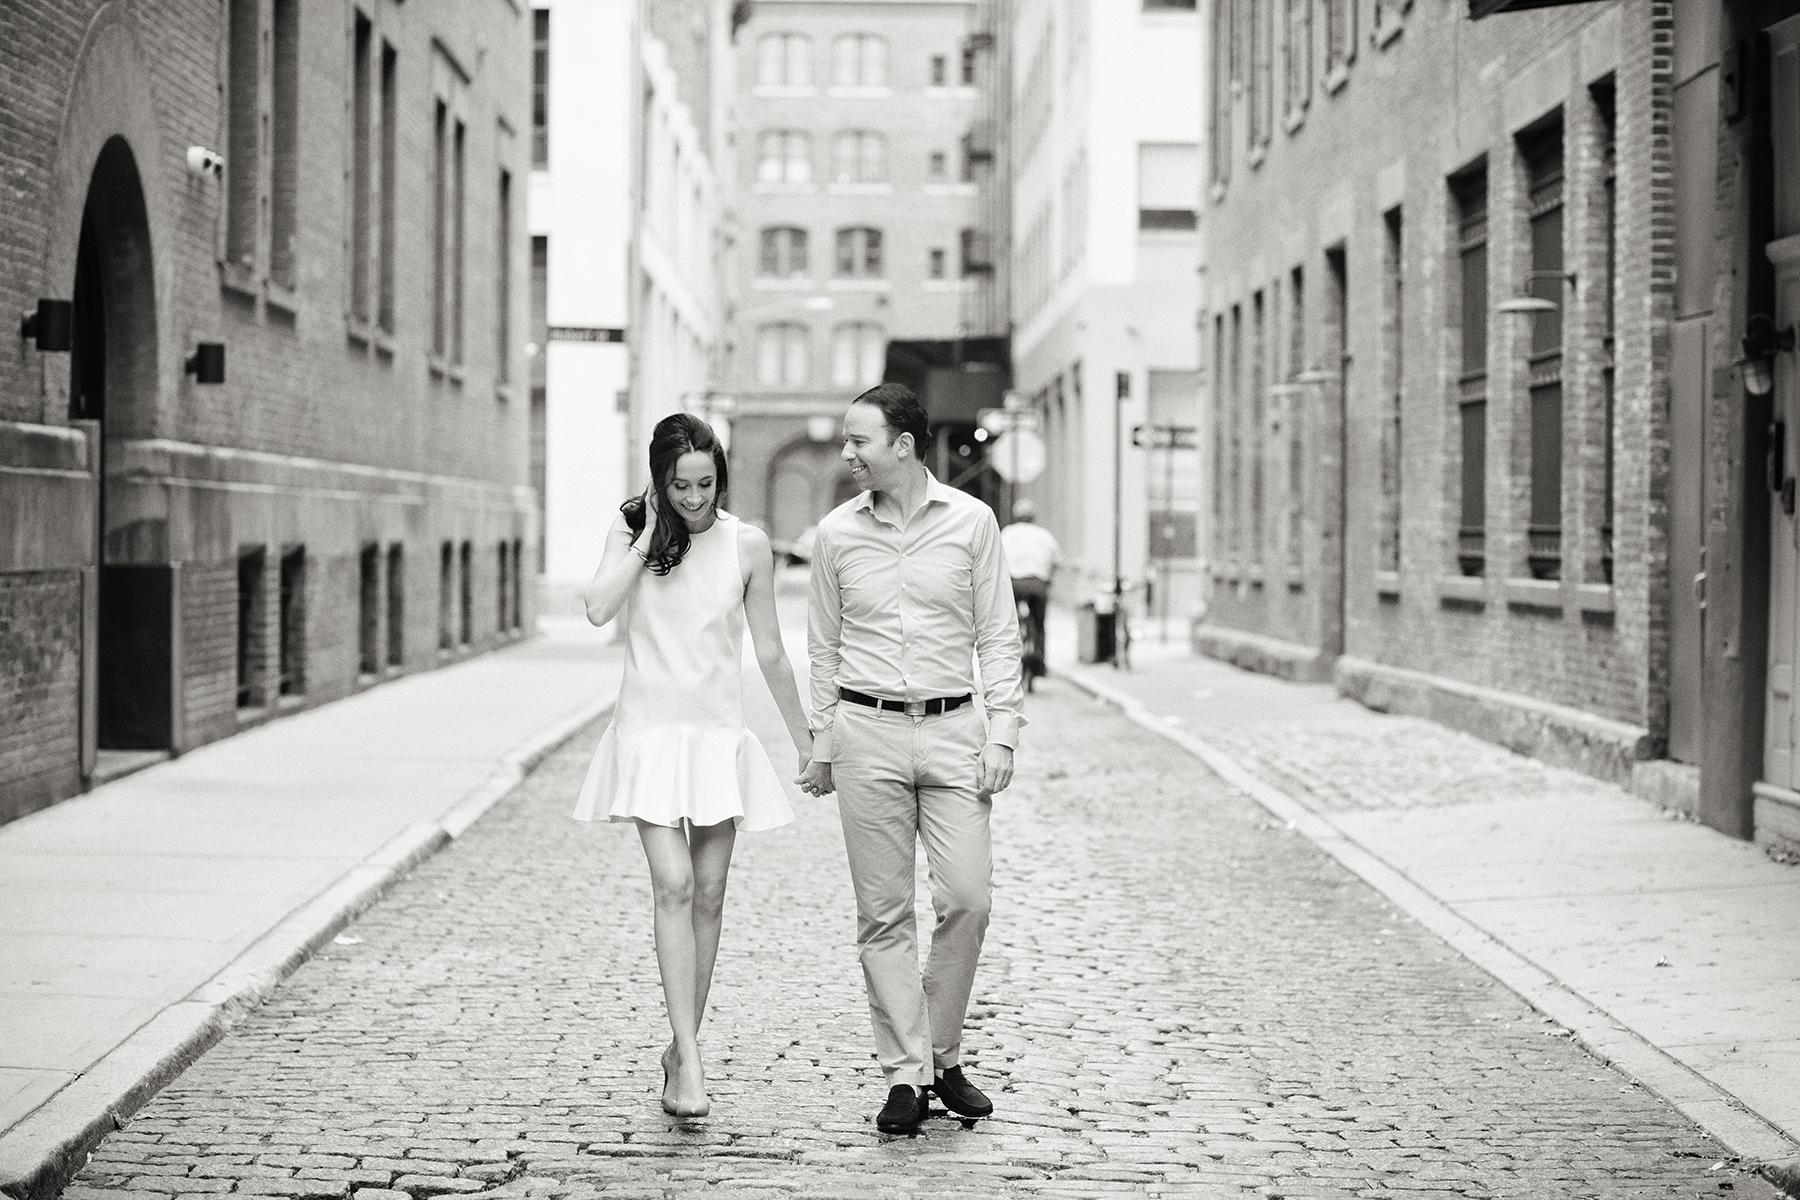 raquelreis_wedding_photography_engagements_005.jpg